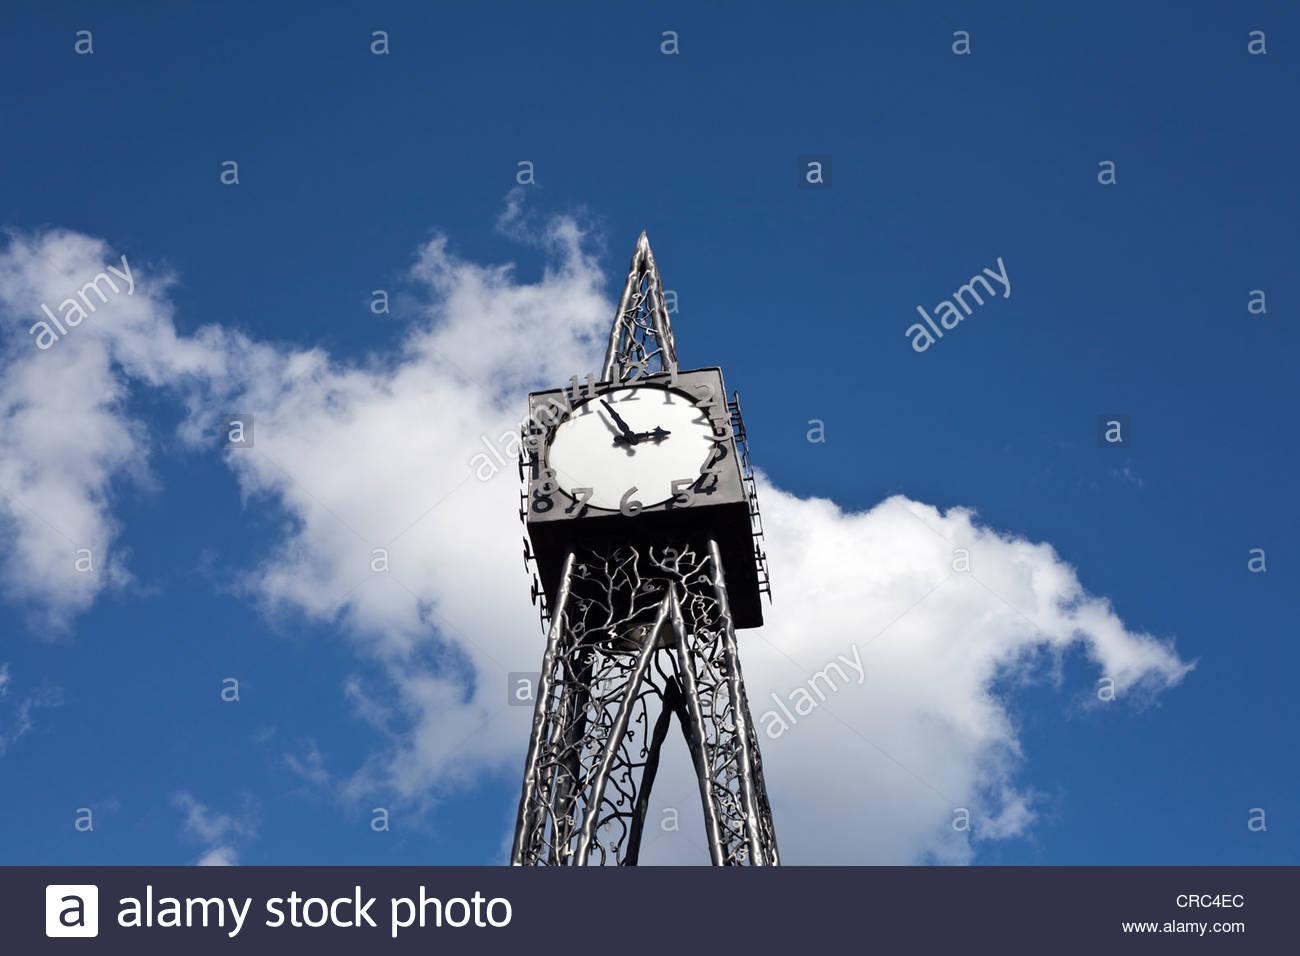 Unusual Clock Face Stock Photos & Unusual Clock Face Stock Images ...